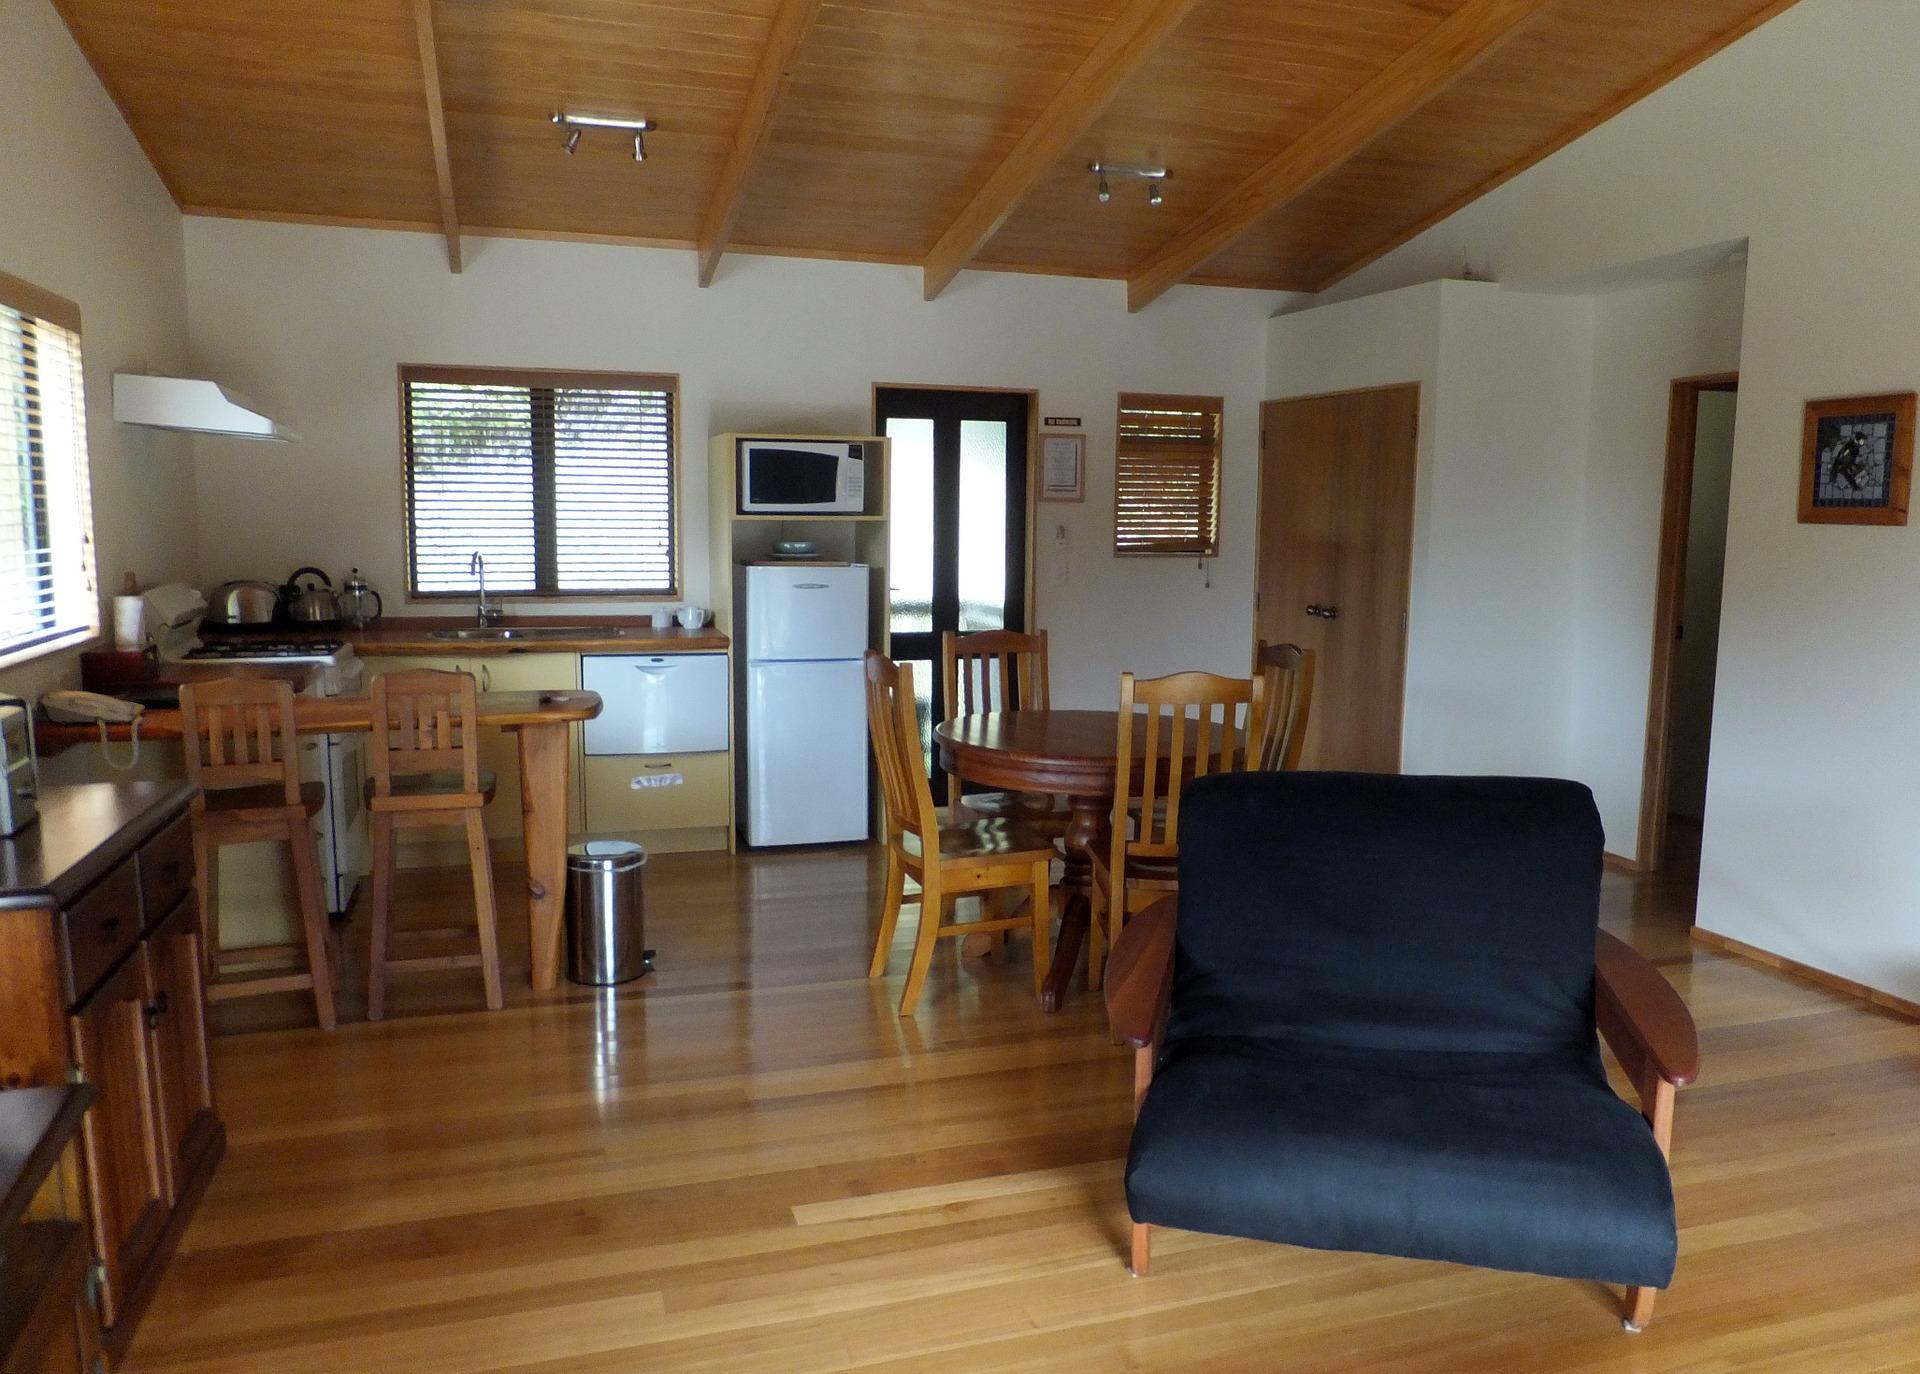 Open Plan Living Room Designing An Open Plan Living Area Intentional Interiors